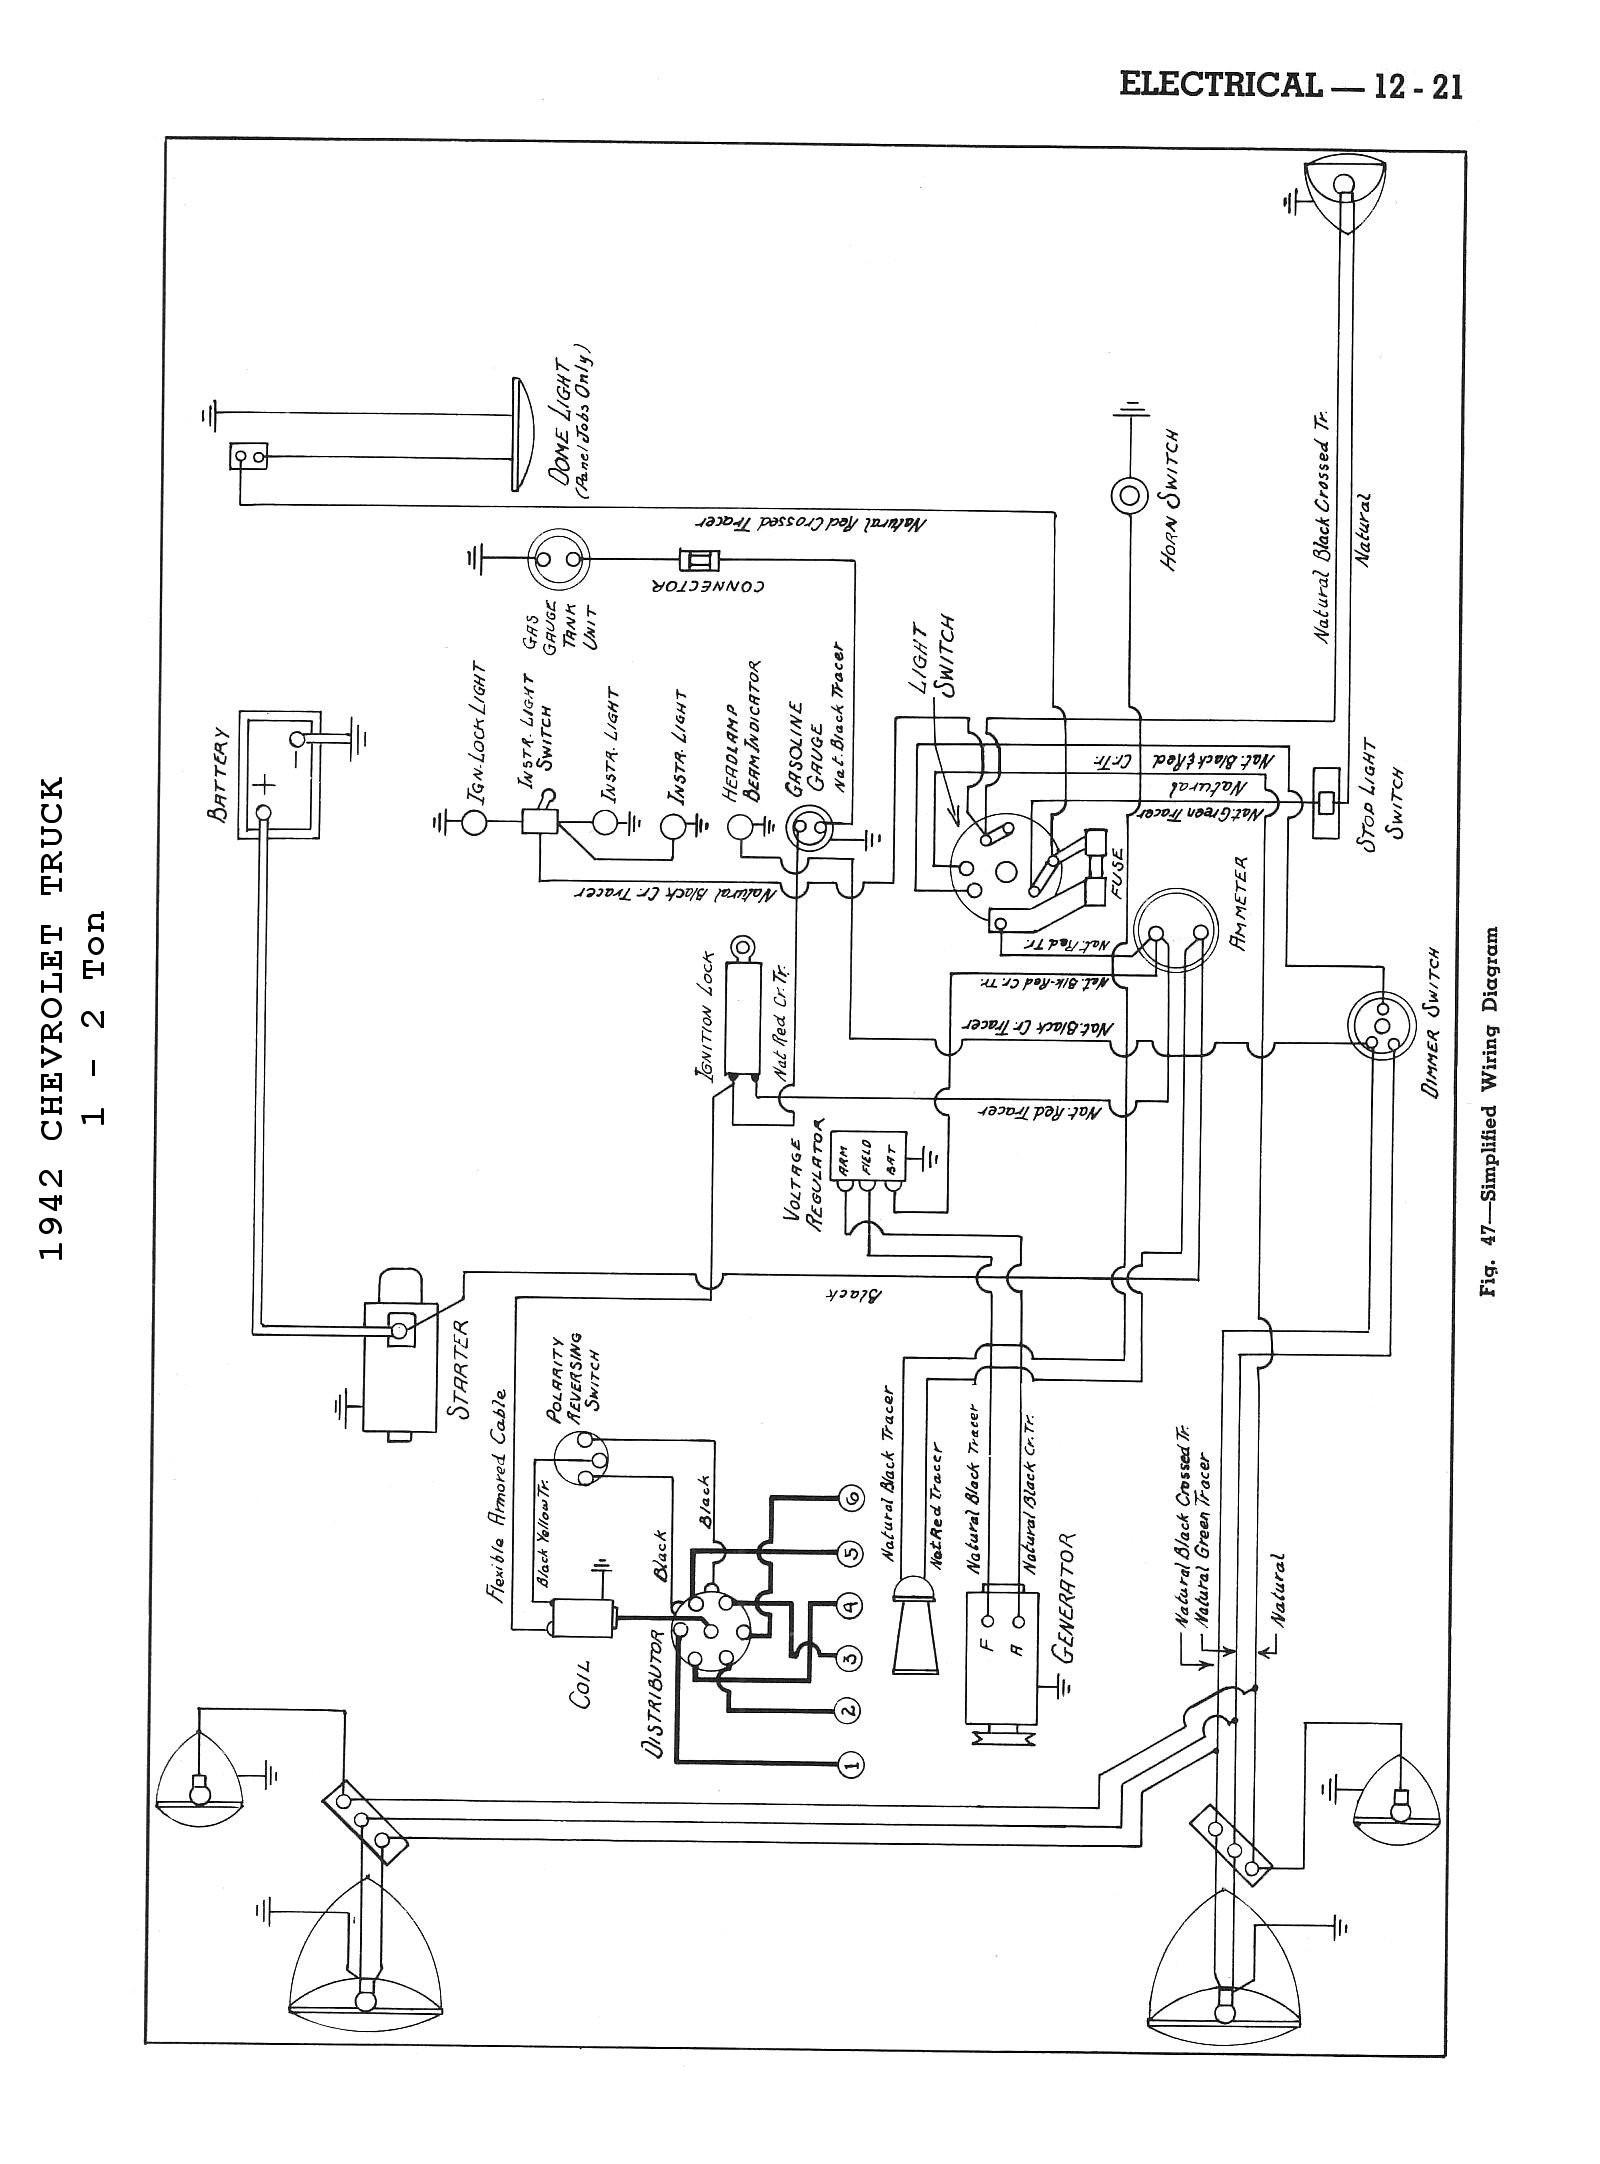 windshield wiper diagram turn signal wiring diagram chevy